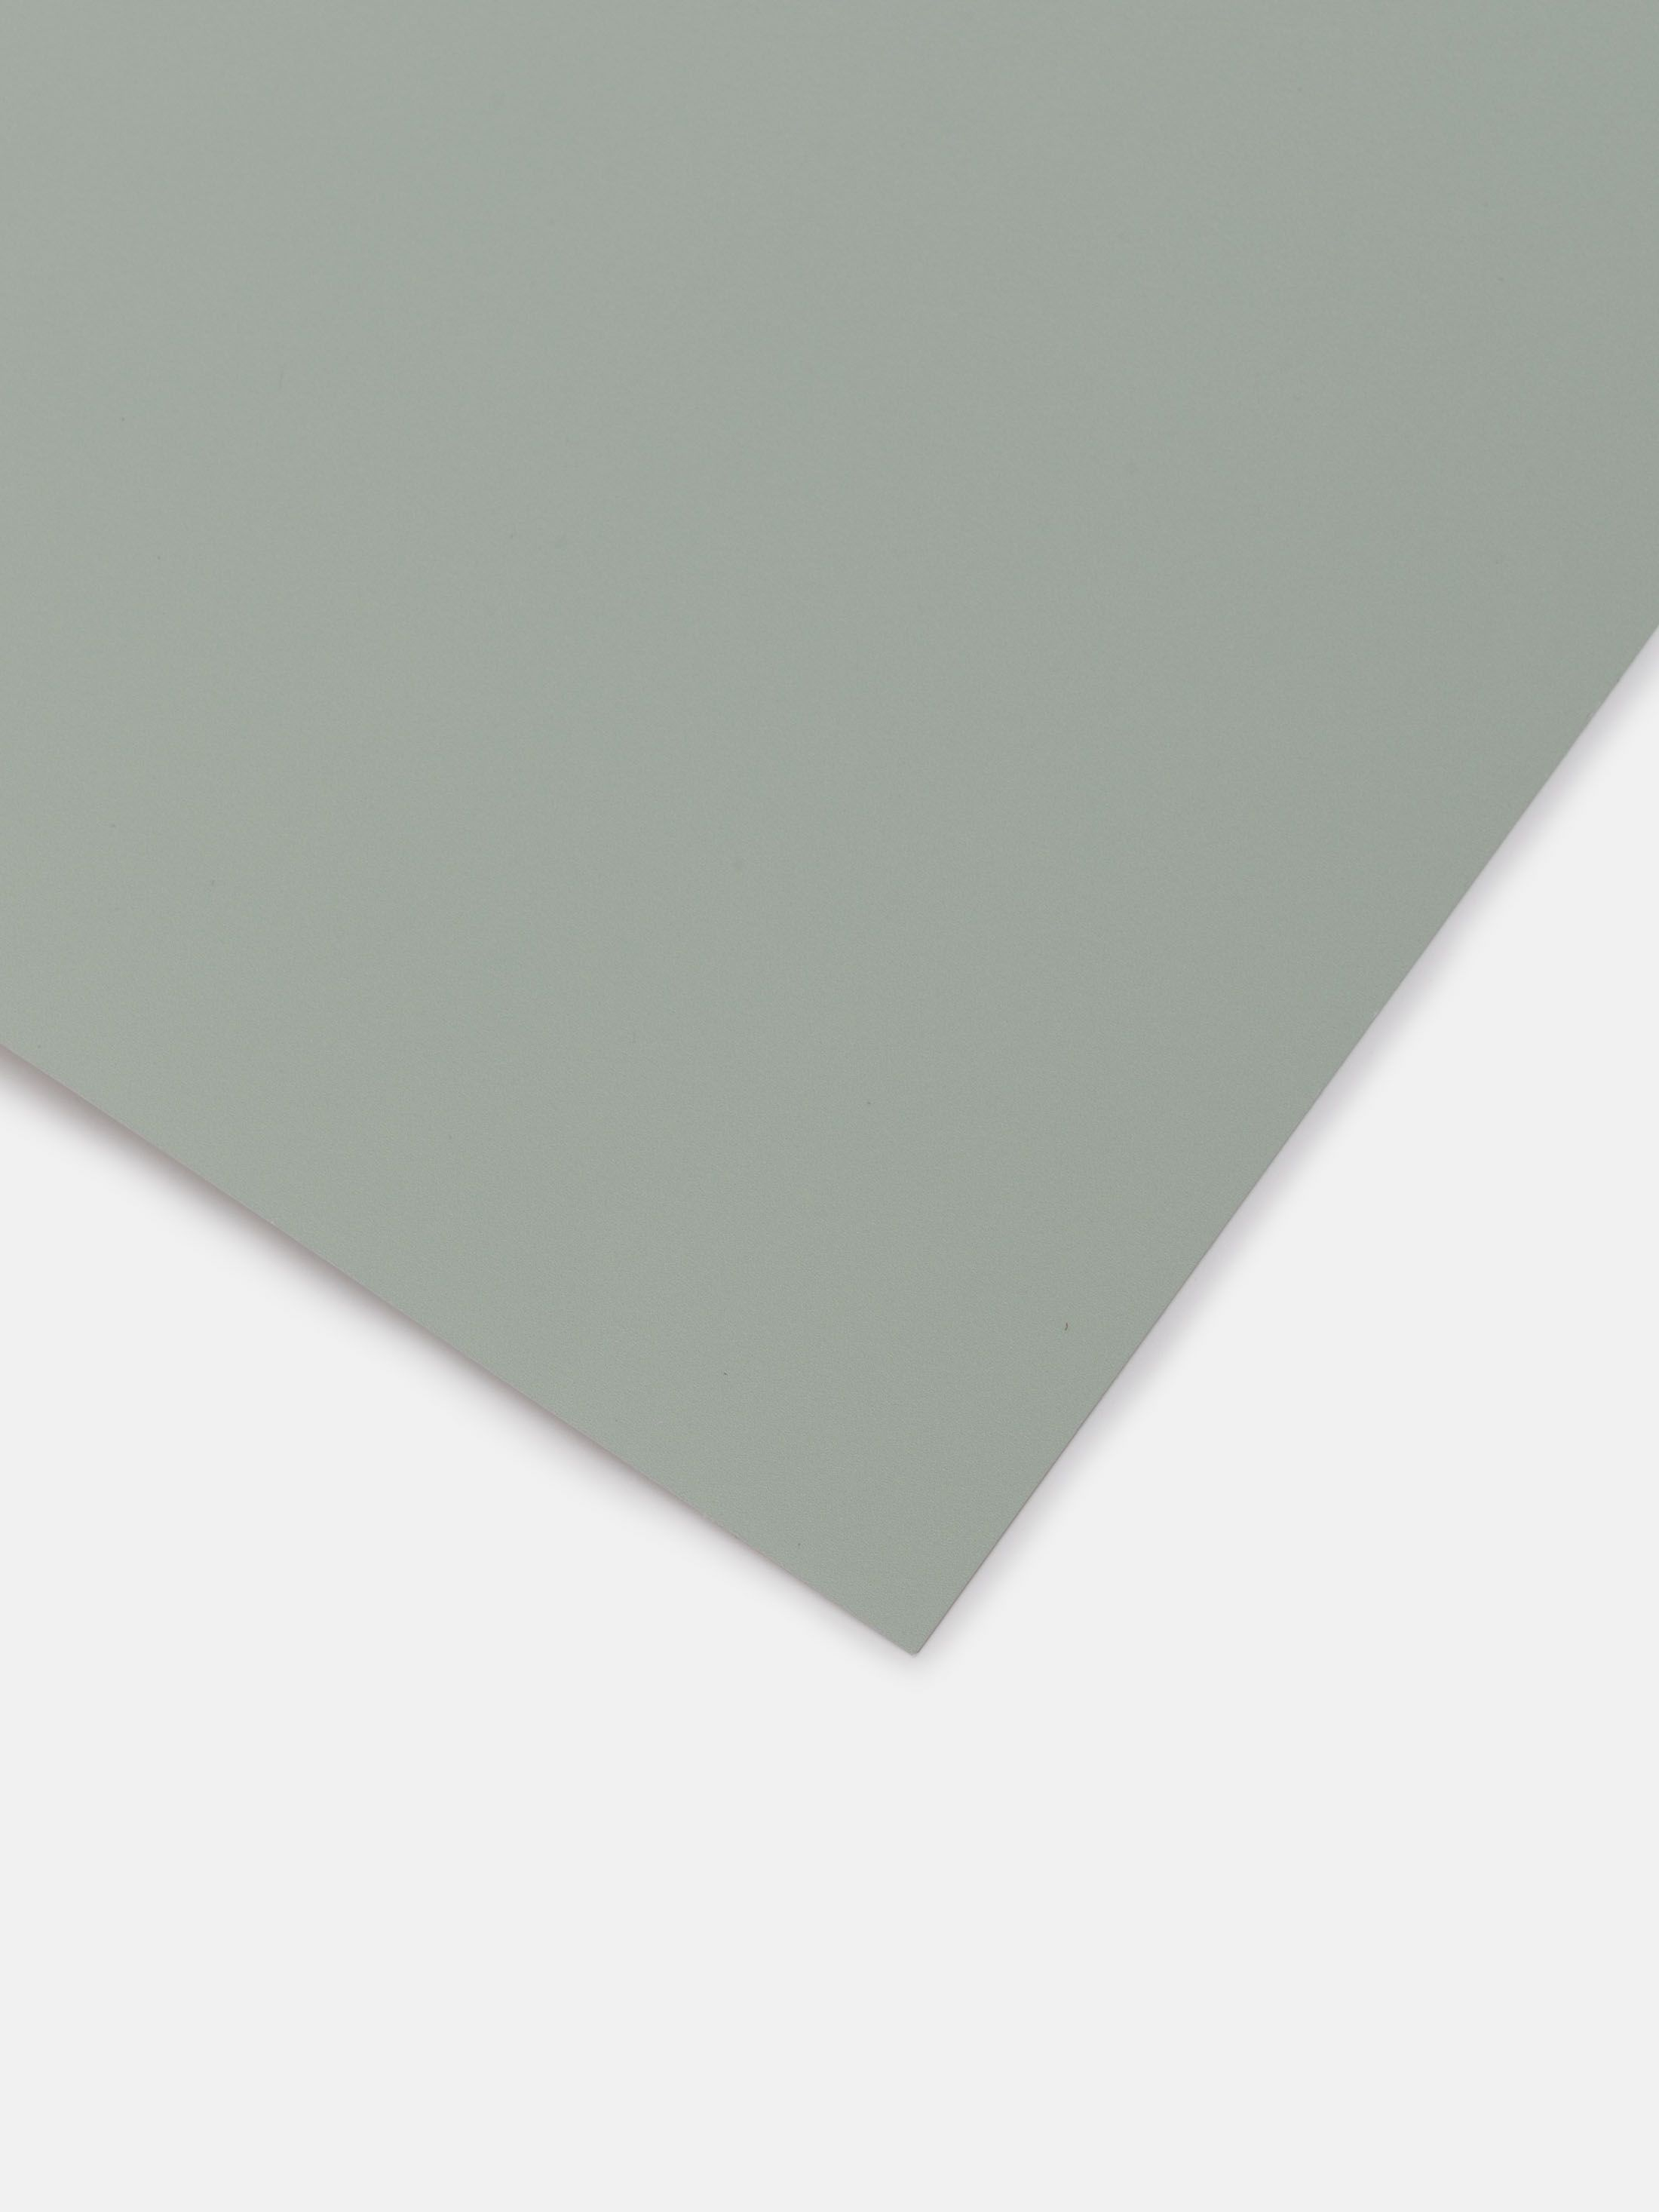 Kunstdrucke Papier Glatt